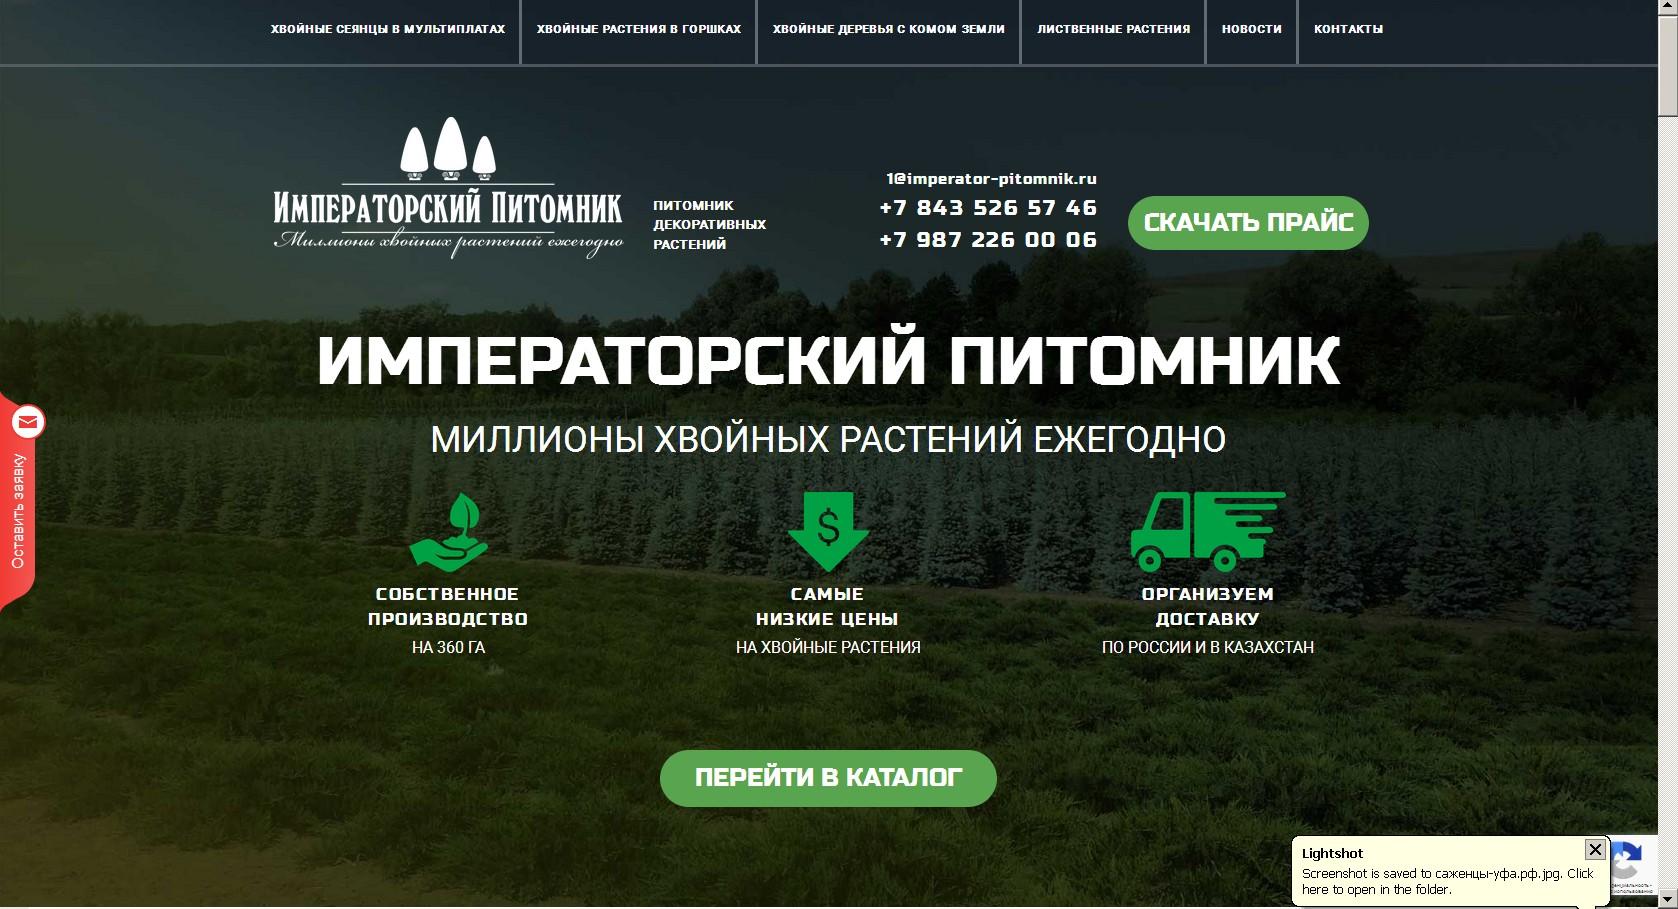 Скриншот интернет-магазина imperator-pitomnik.ru